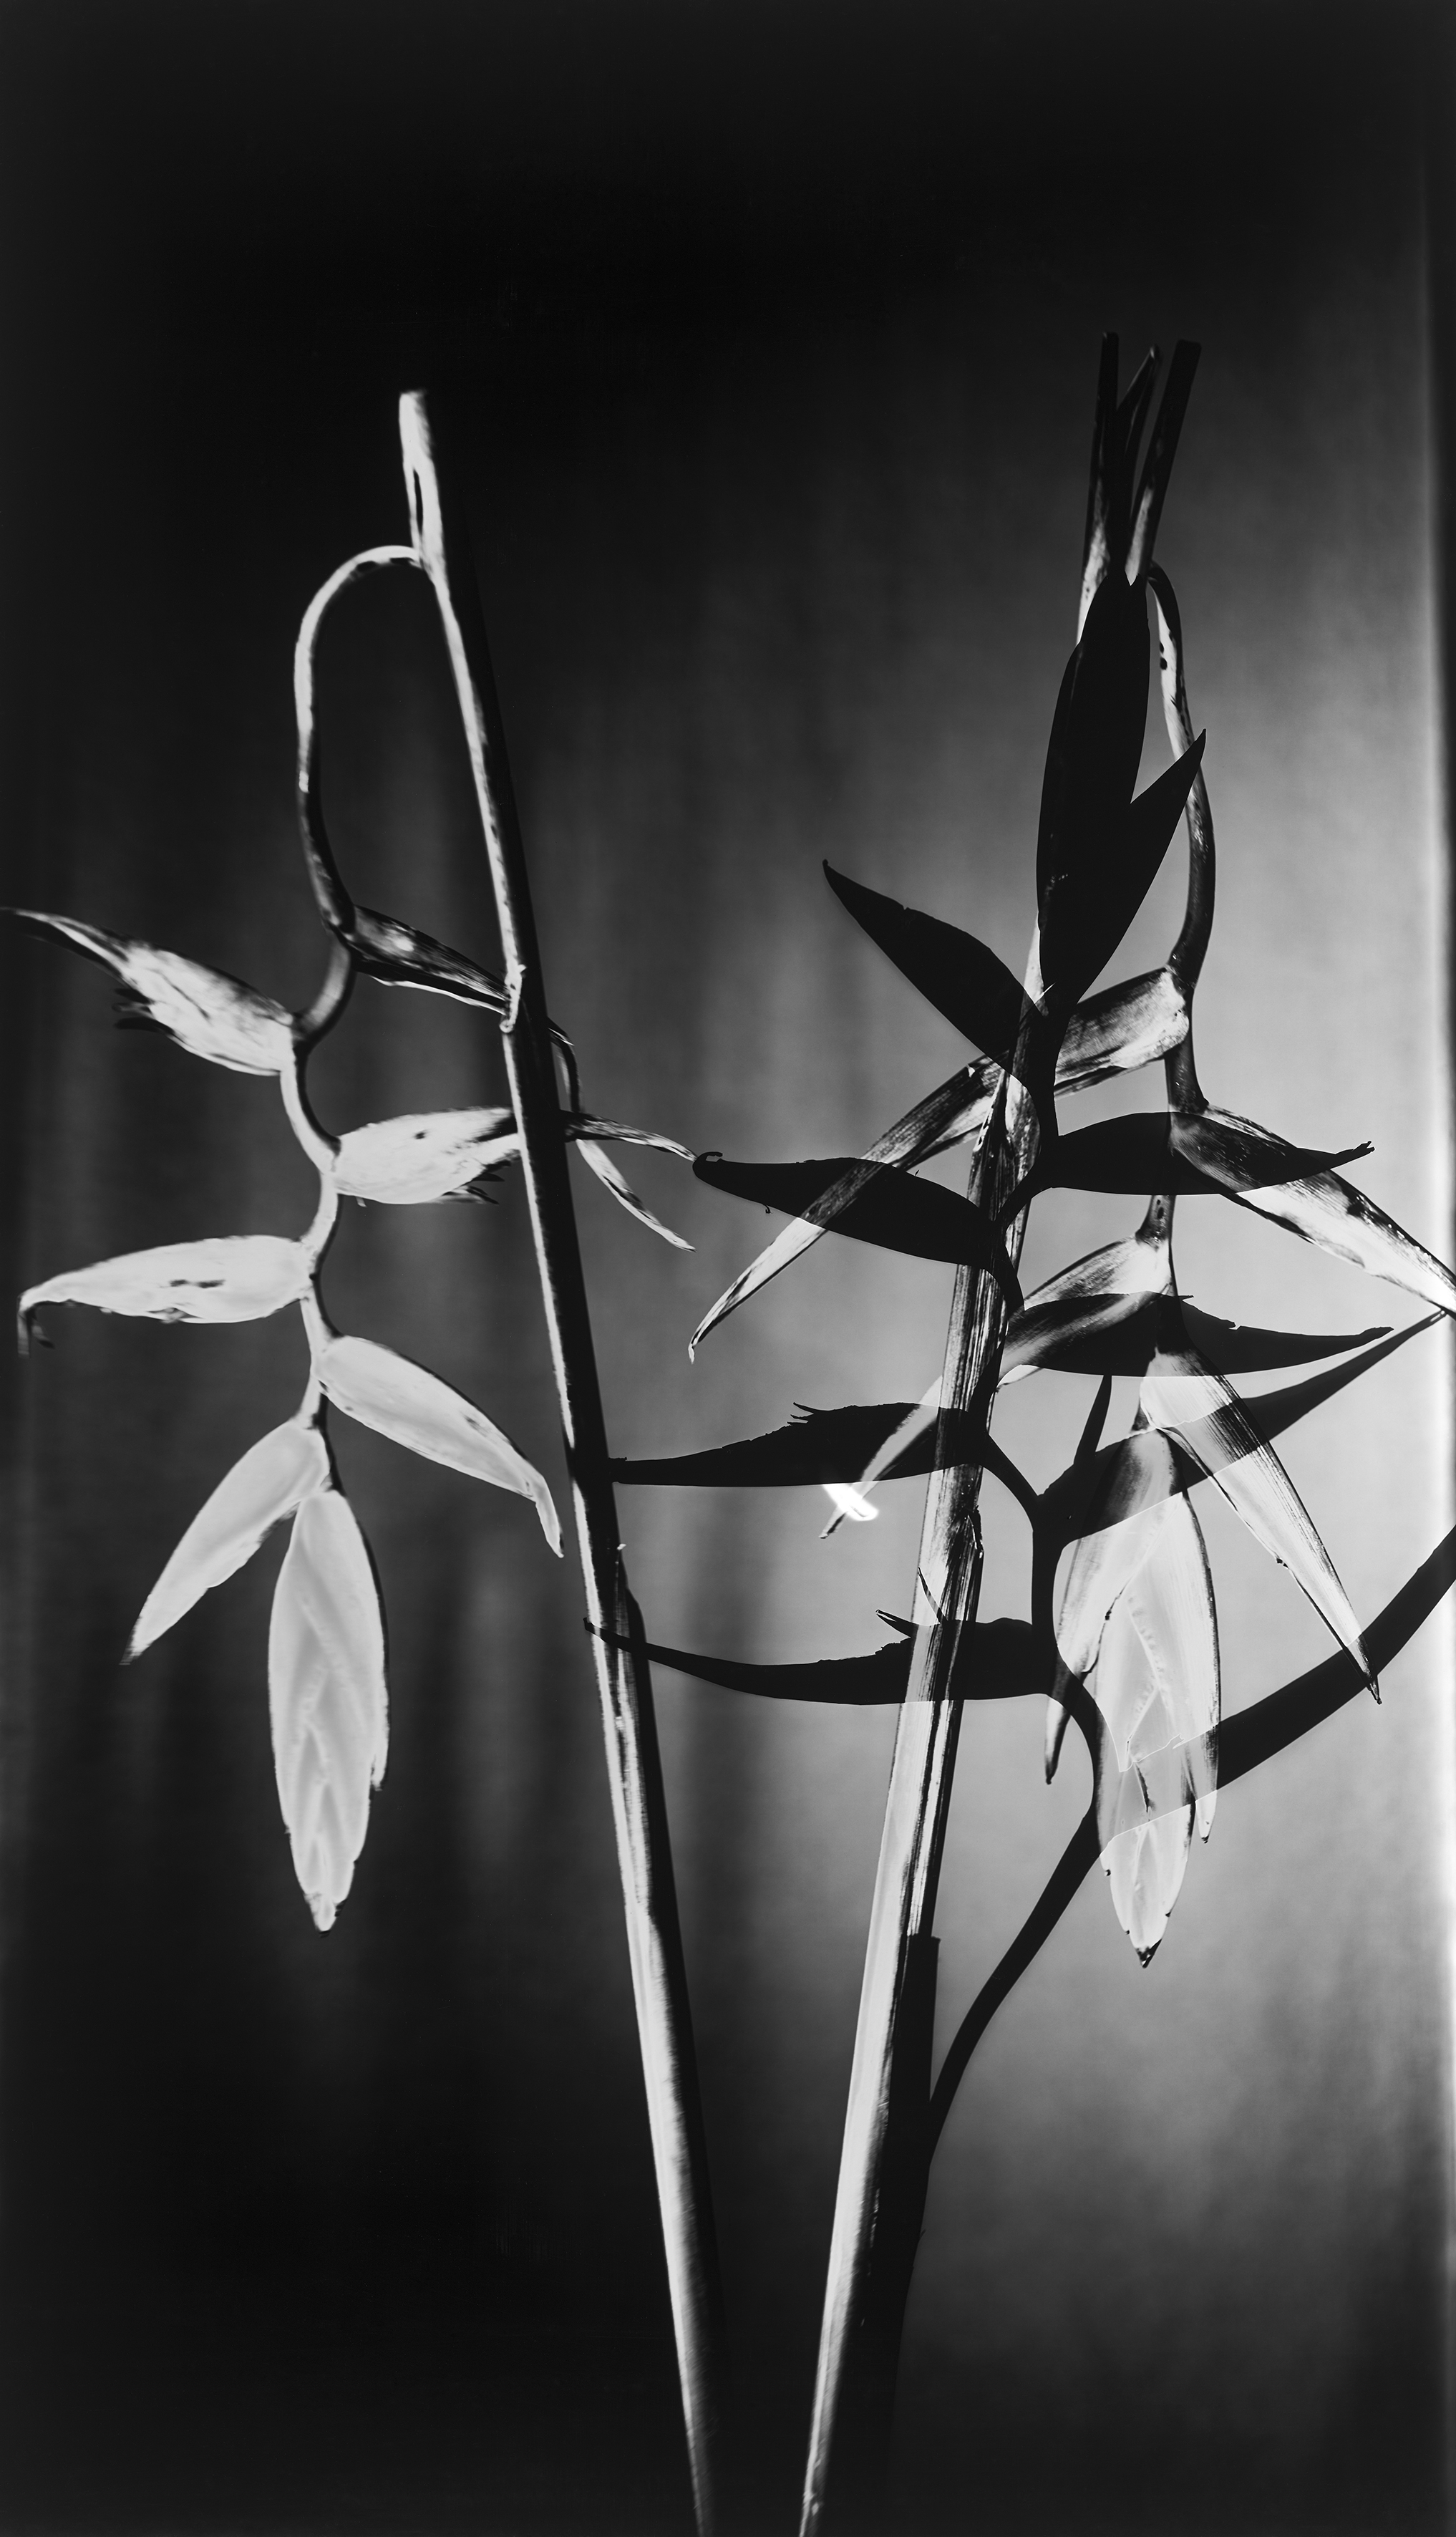 Papageienblumen-62x108-cm